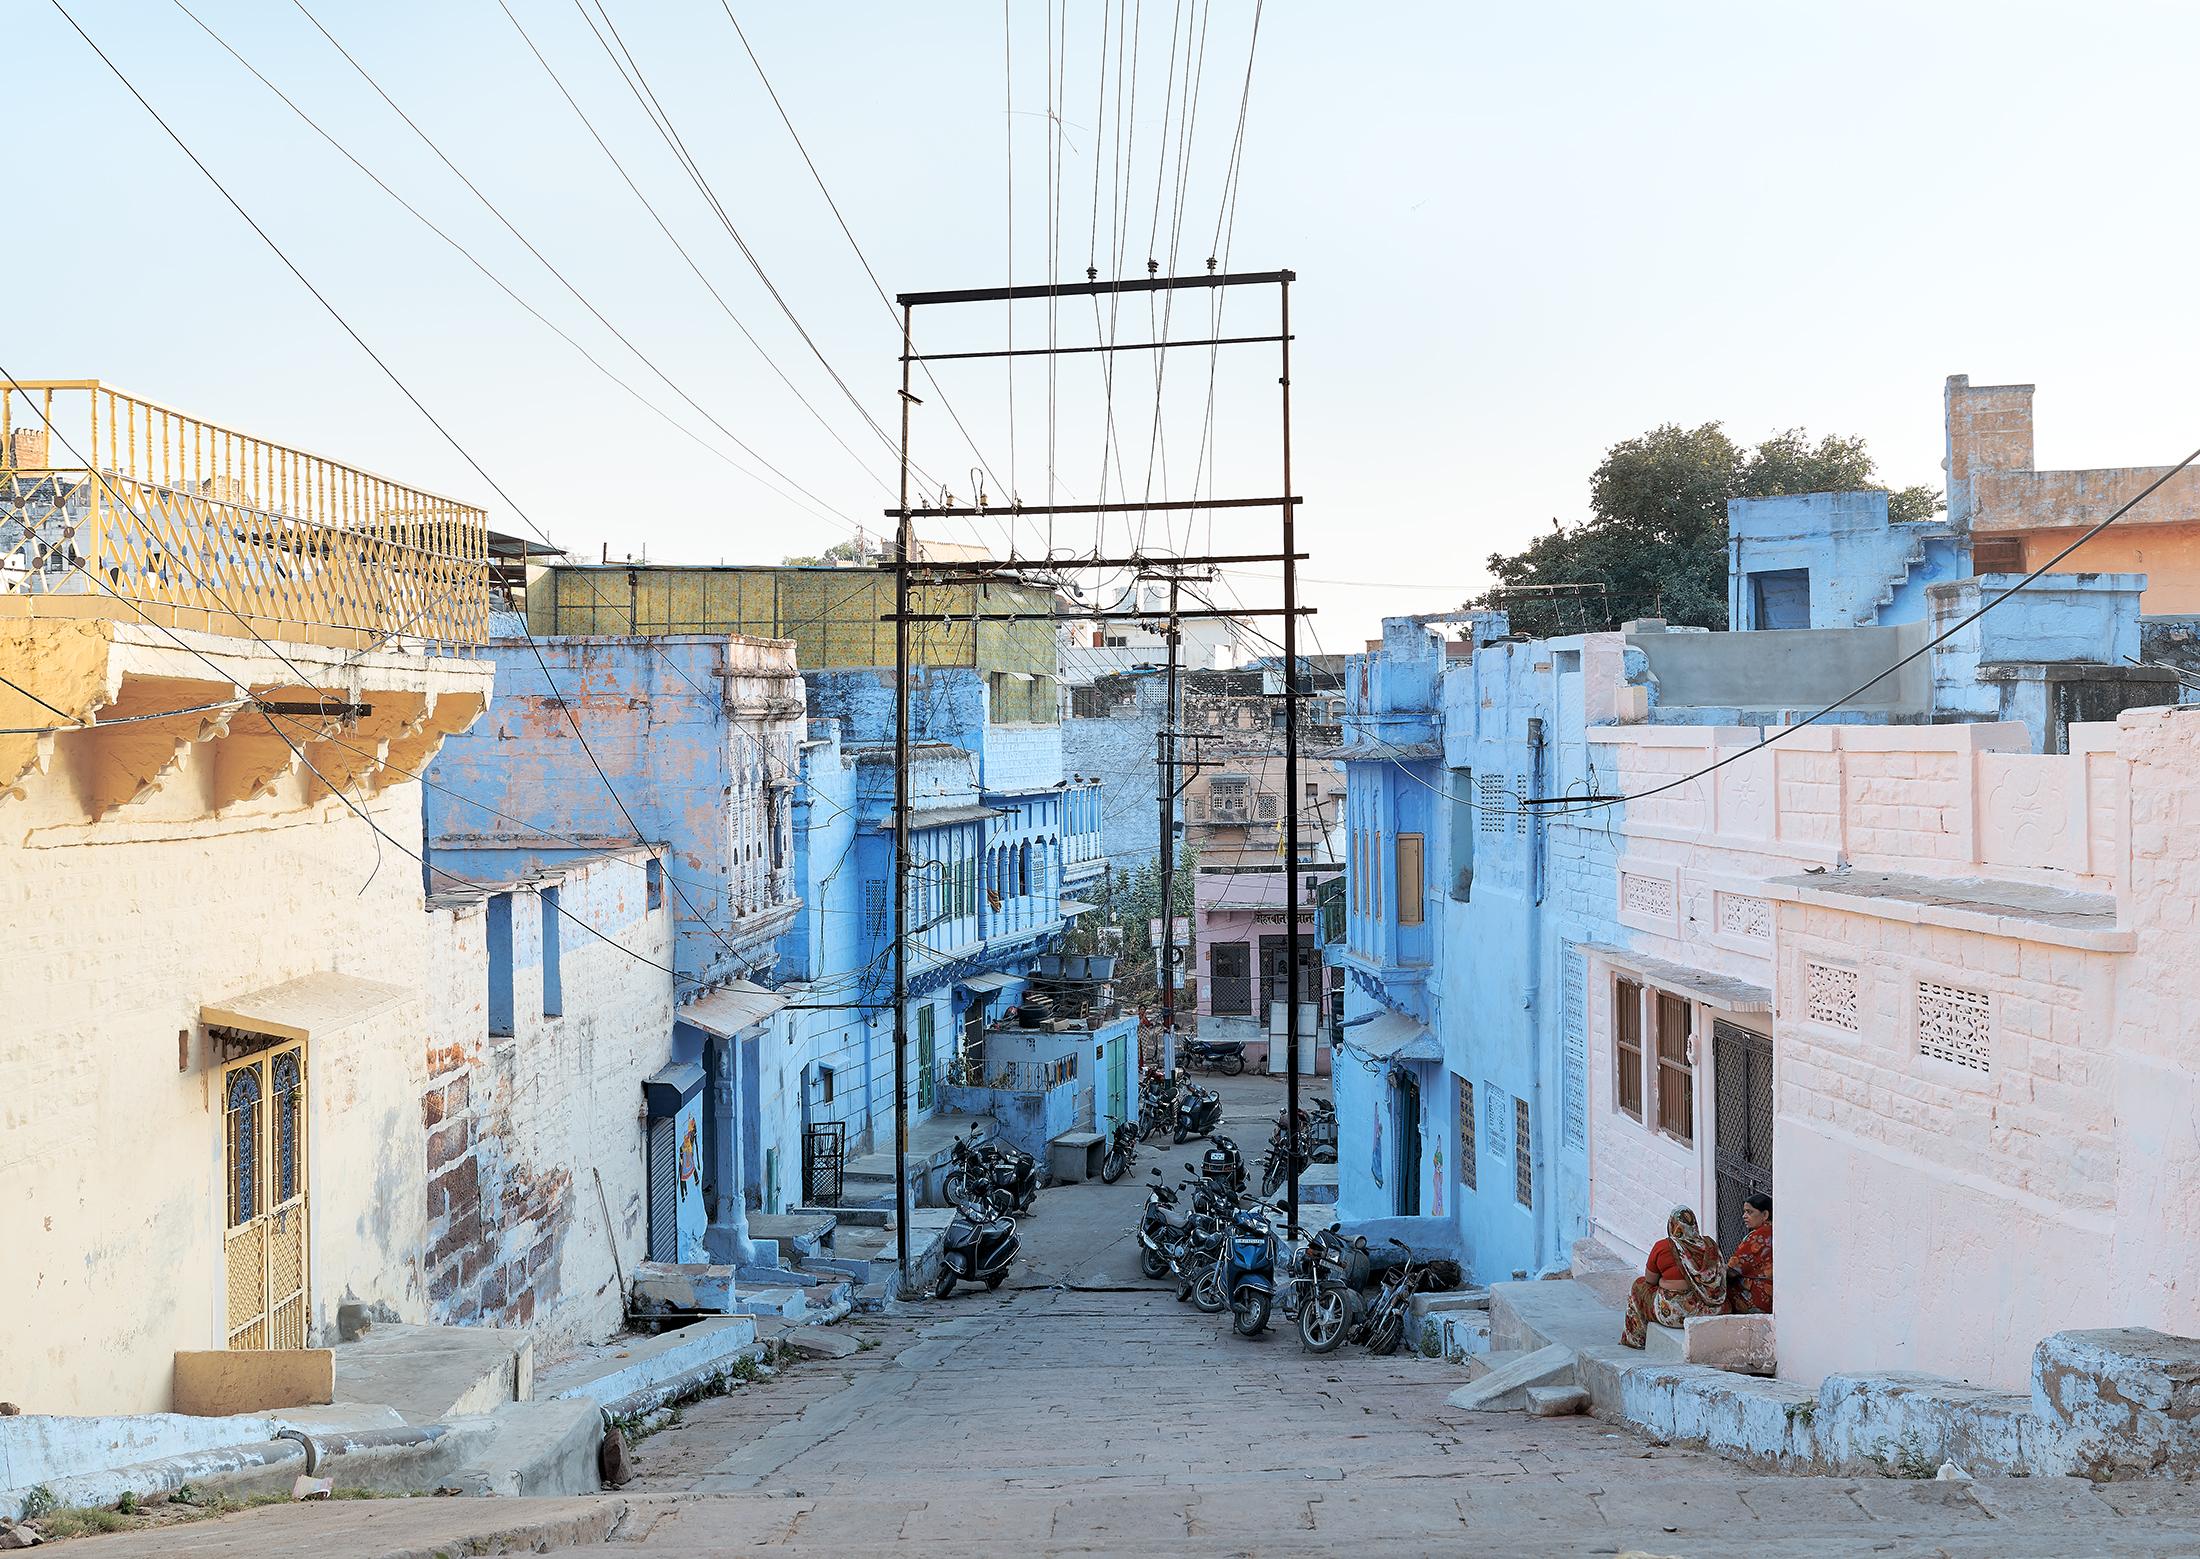 12_Blue street, Jodhpur, India, 2017.jpg